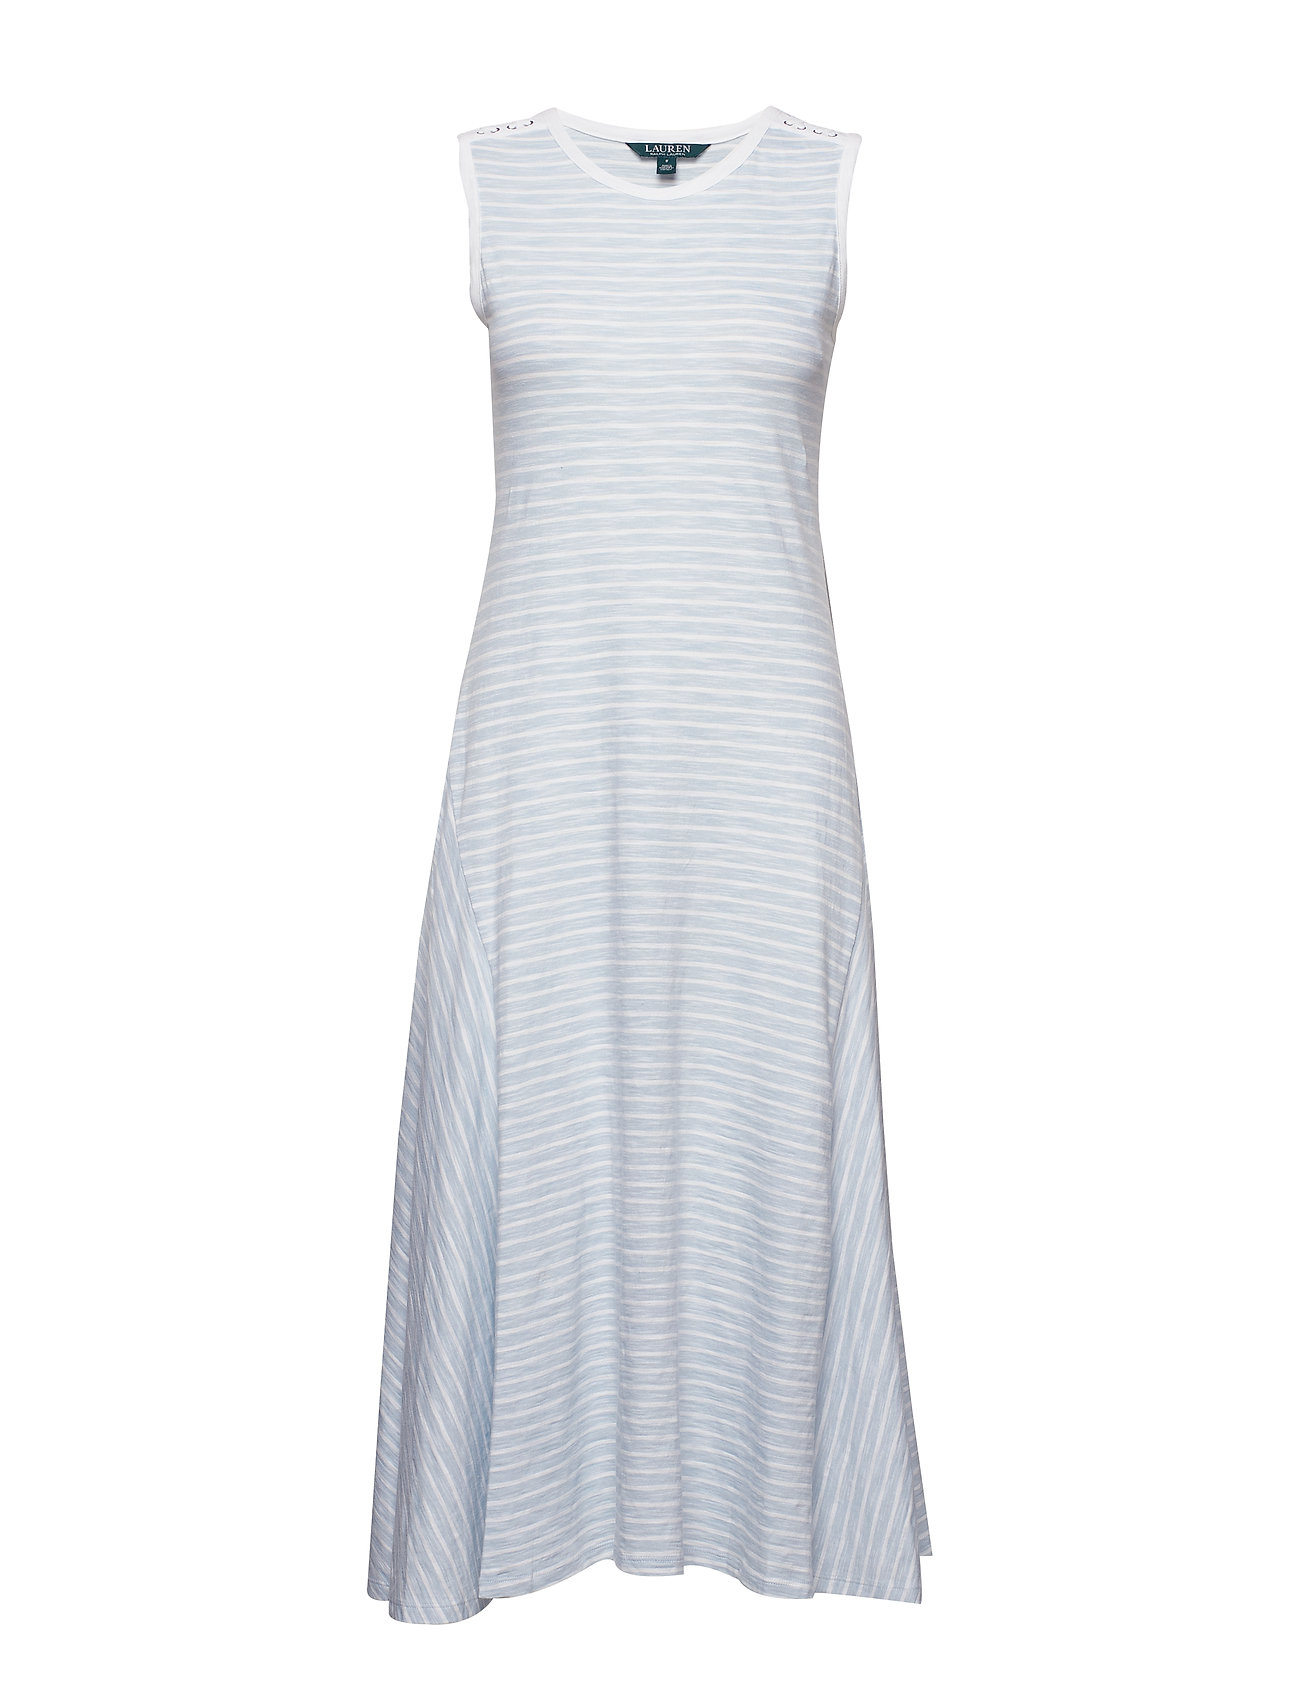 Lauren Ralph Lauren Striped Cotton Dress